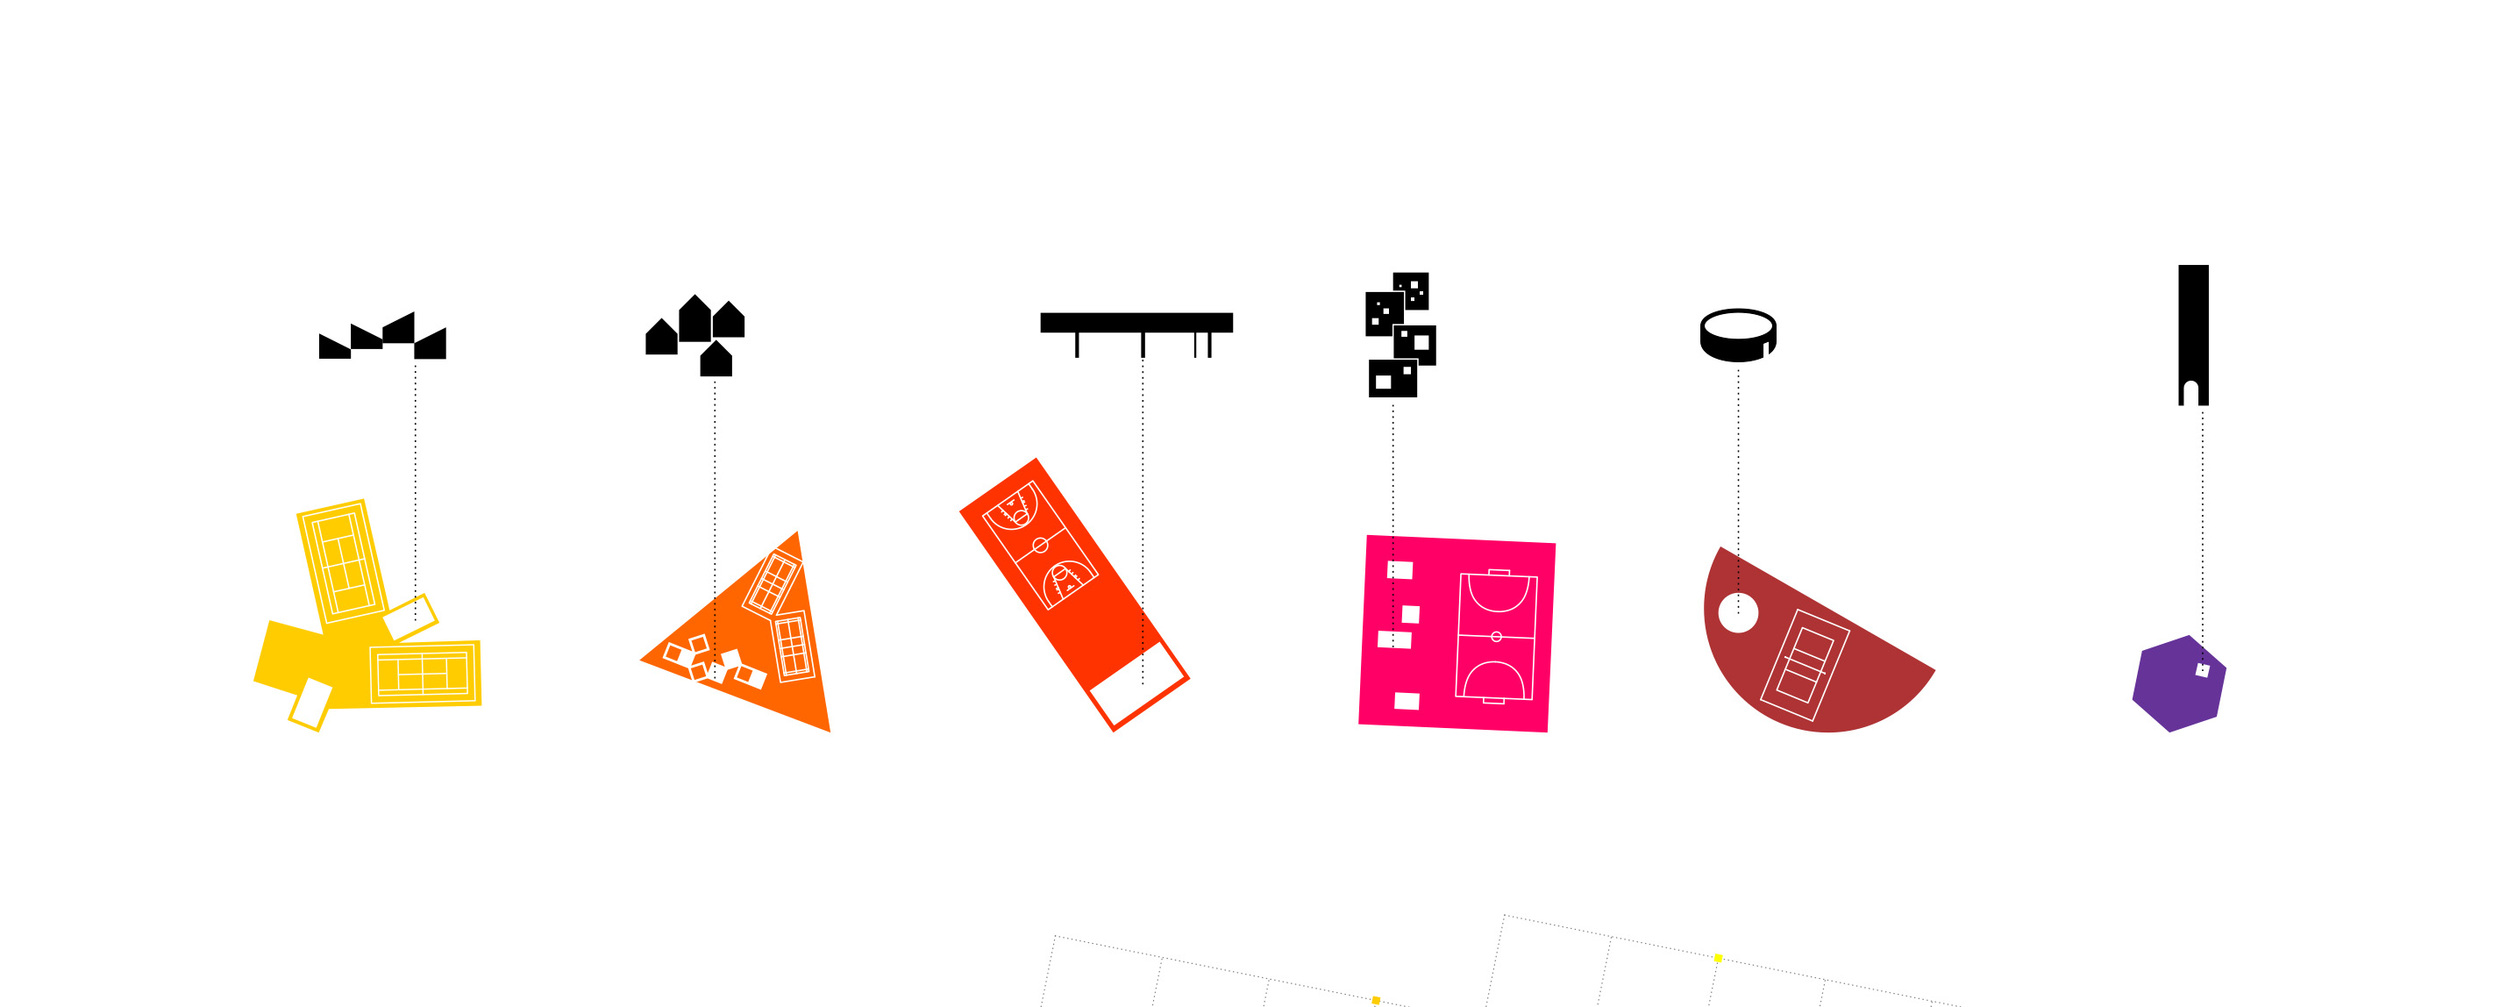 Different public program for each square